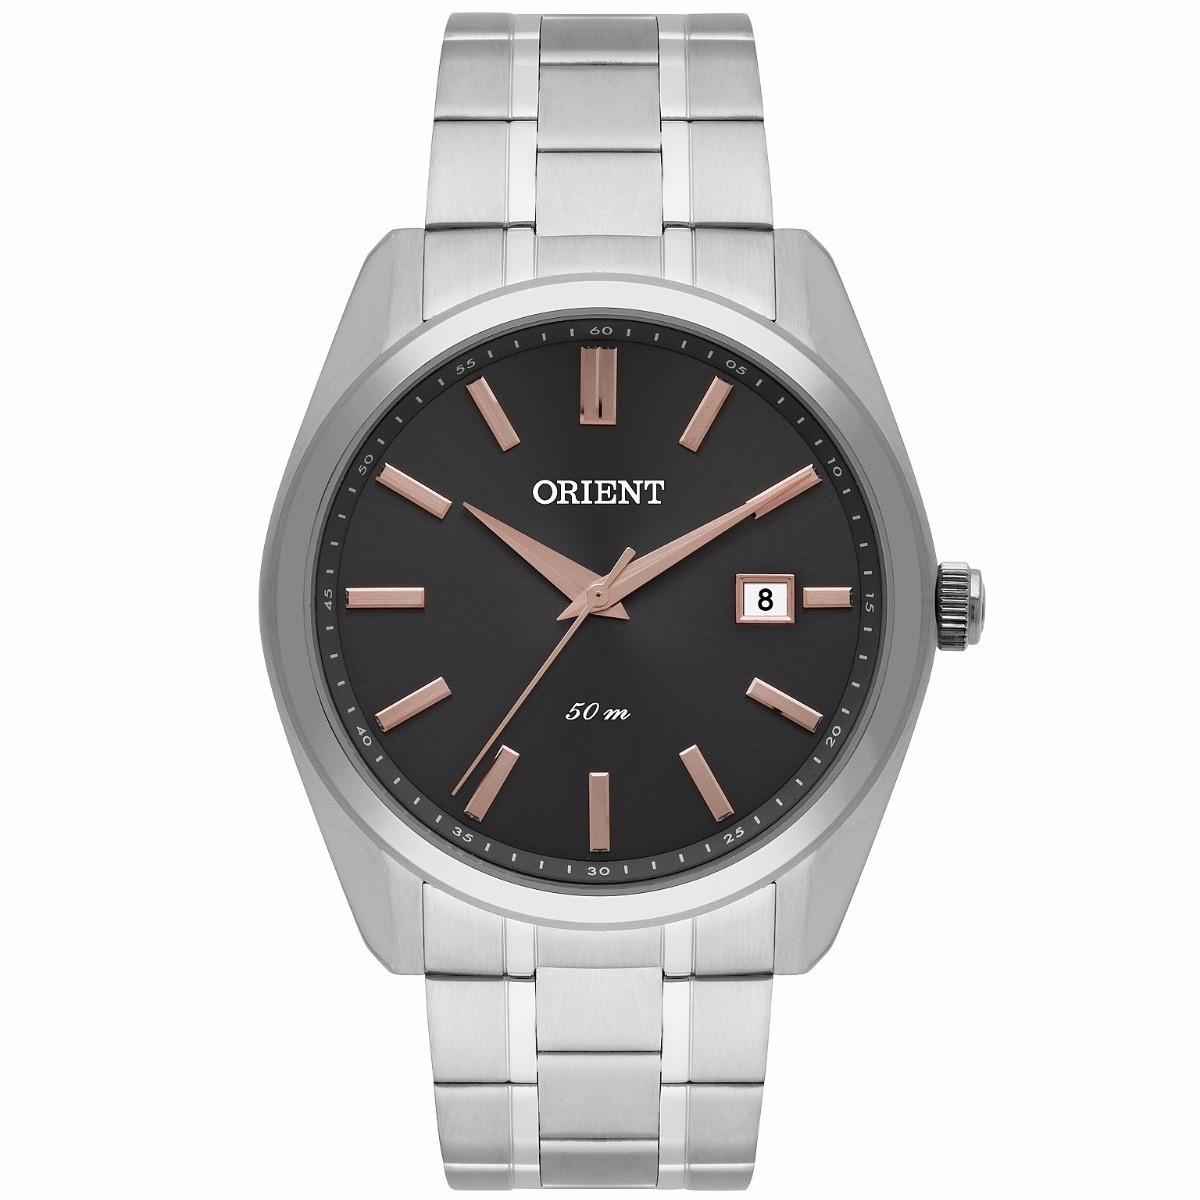 Relógio Orient Masculino - Mbss1322 G1SX  - Dumont Online - Joias e Relógios